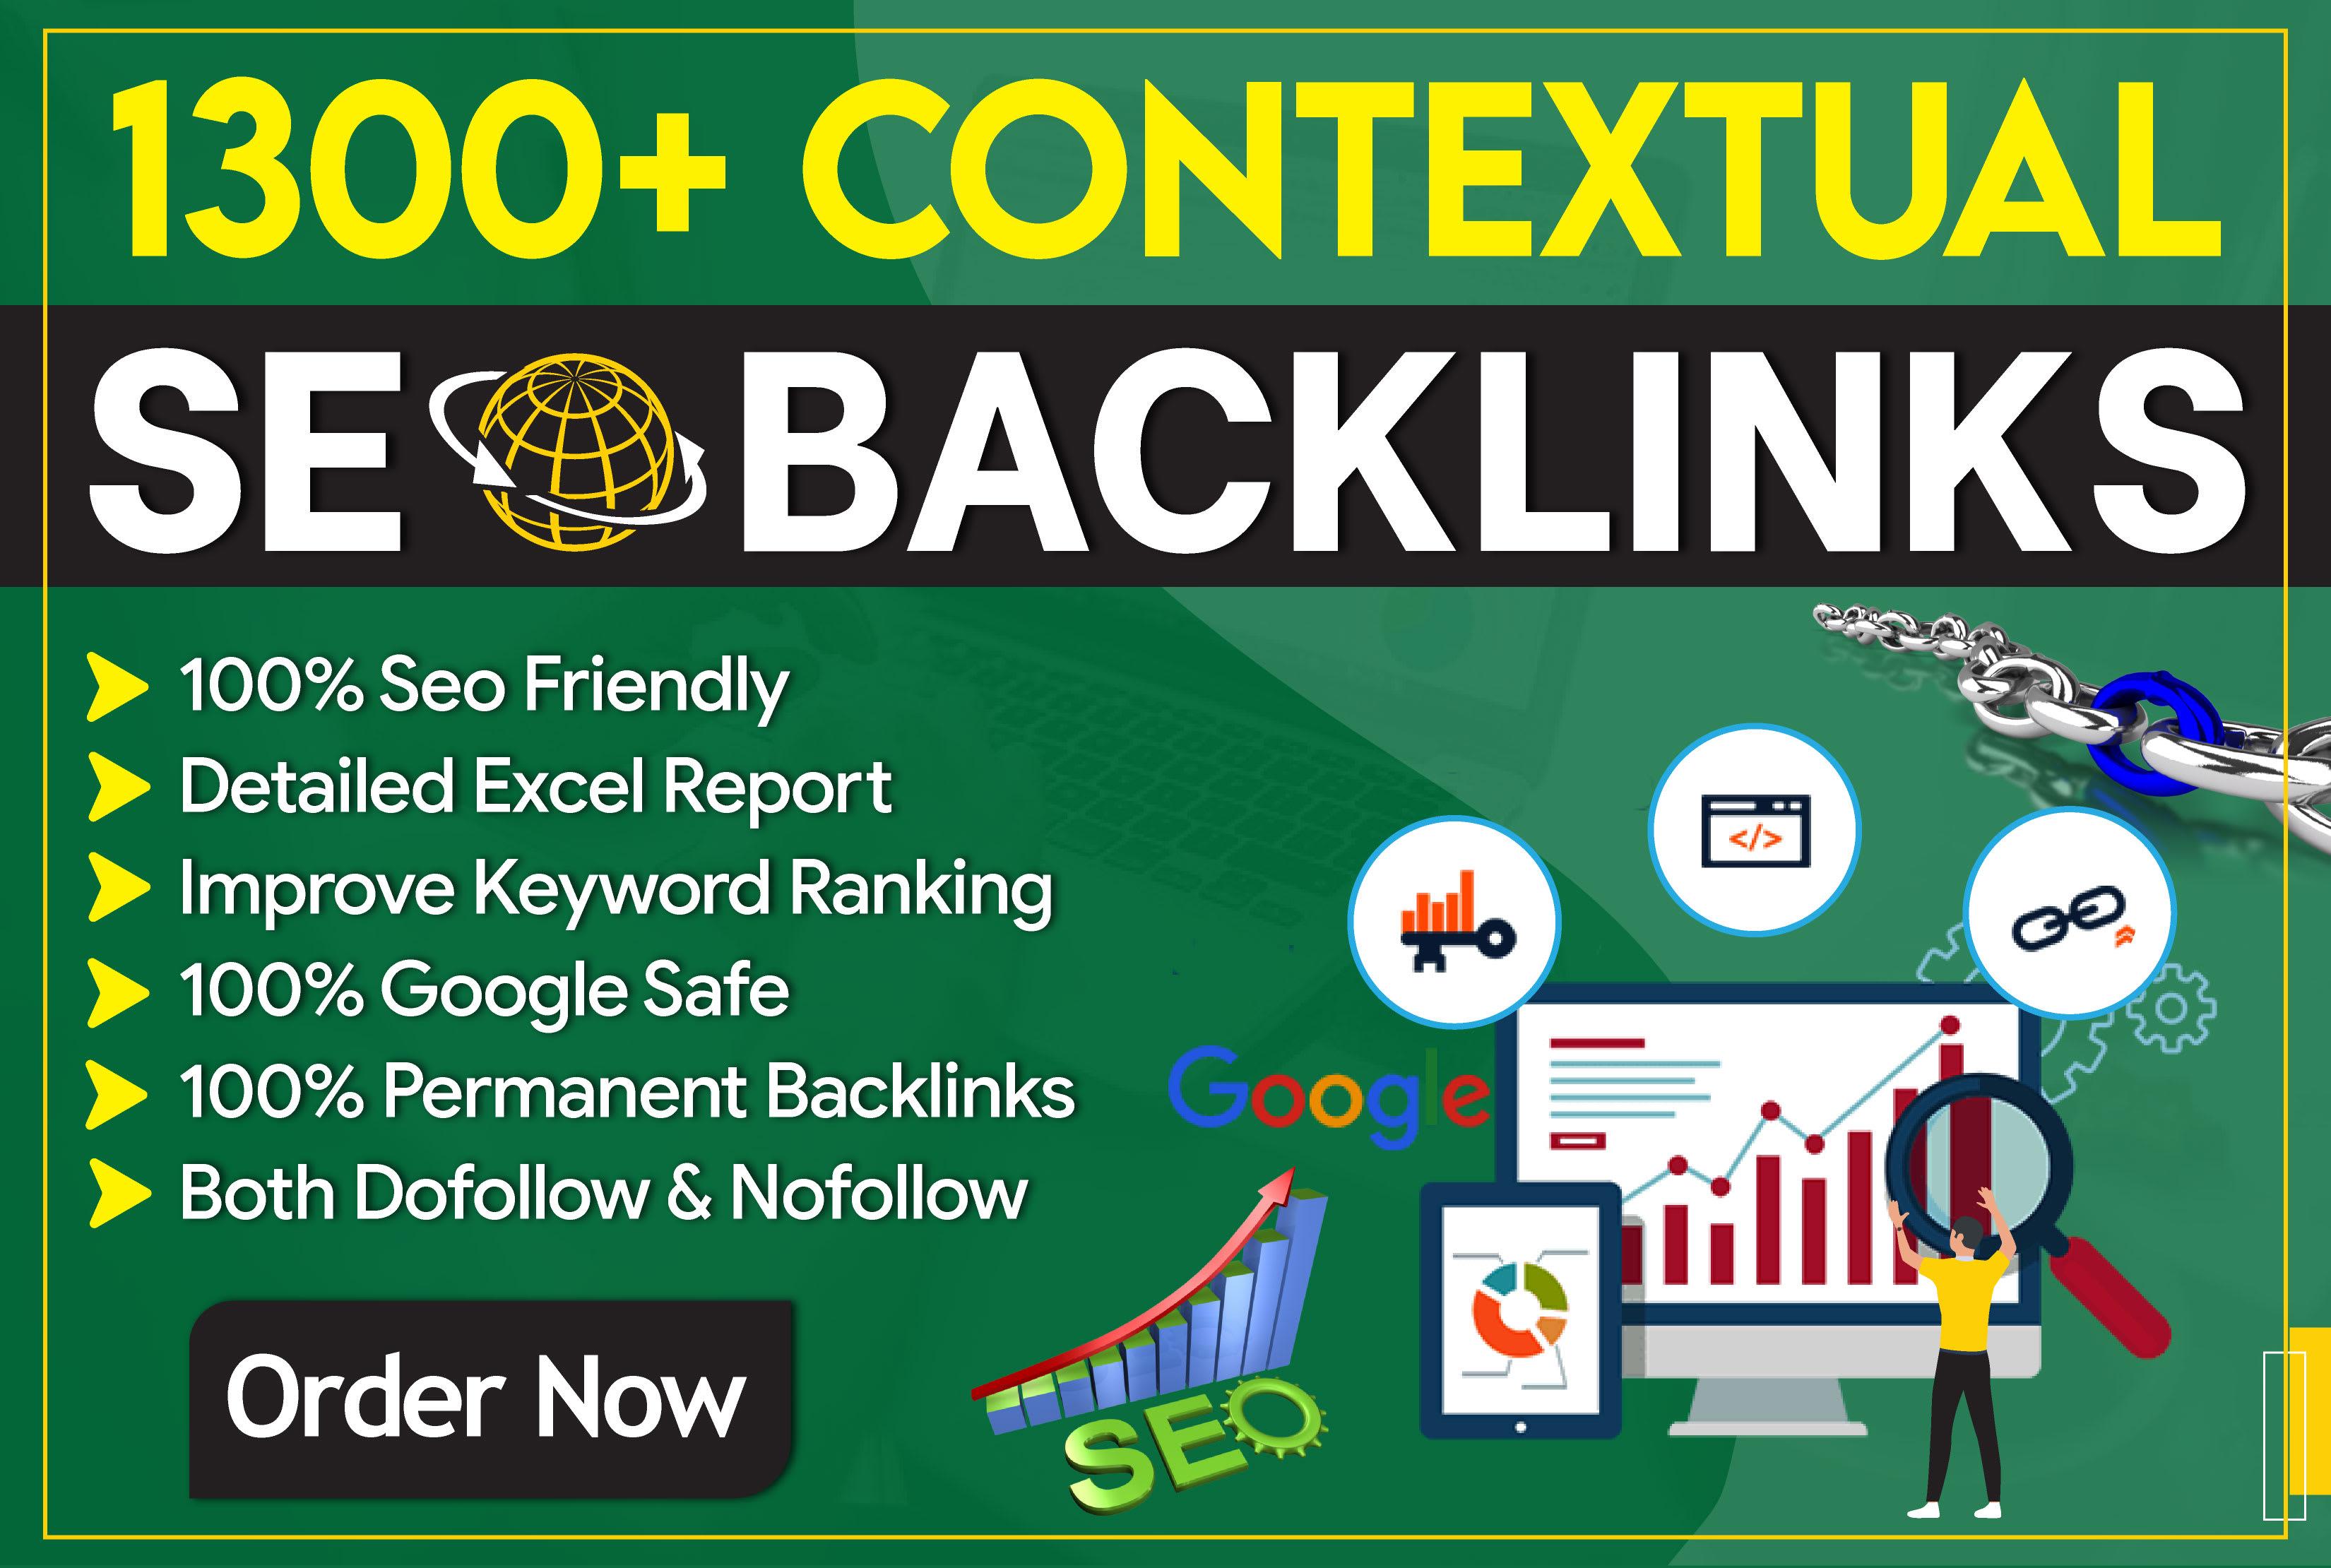 Build 1300 Plus Manual Contextual Dofollow Seo Backlinks Service